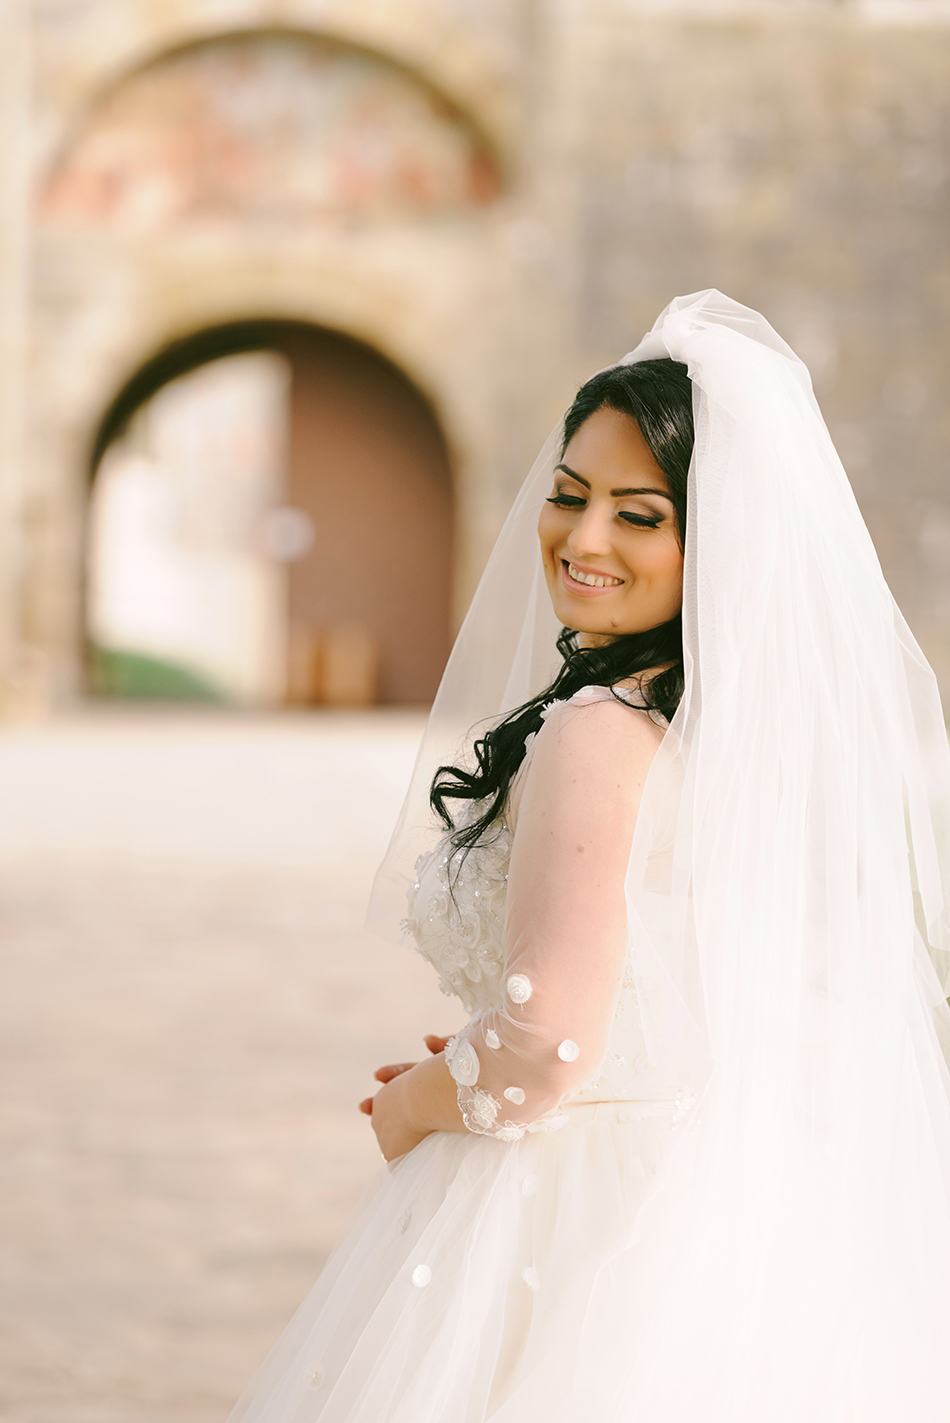 AD Passion Photography | ad-passion_diana-si-gabi_fotograf-nunta-suceava_0081 | Adelin, Dida, fotograf profesionist, fotograf de nunta, fotografie de nunta, fotograf Timisoara, fotograf Craiova, fotograf Bucuresti, fotograf Arad, nunta Timisoara, nunta Arad, nunta Bucuresti, nunta Craiova